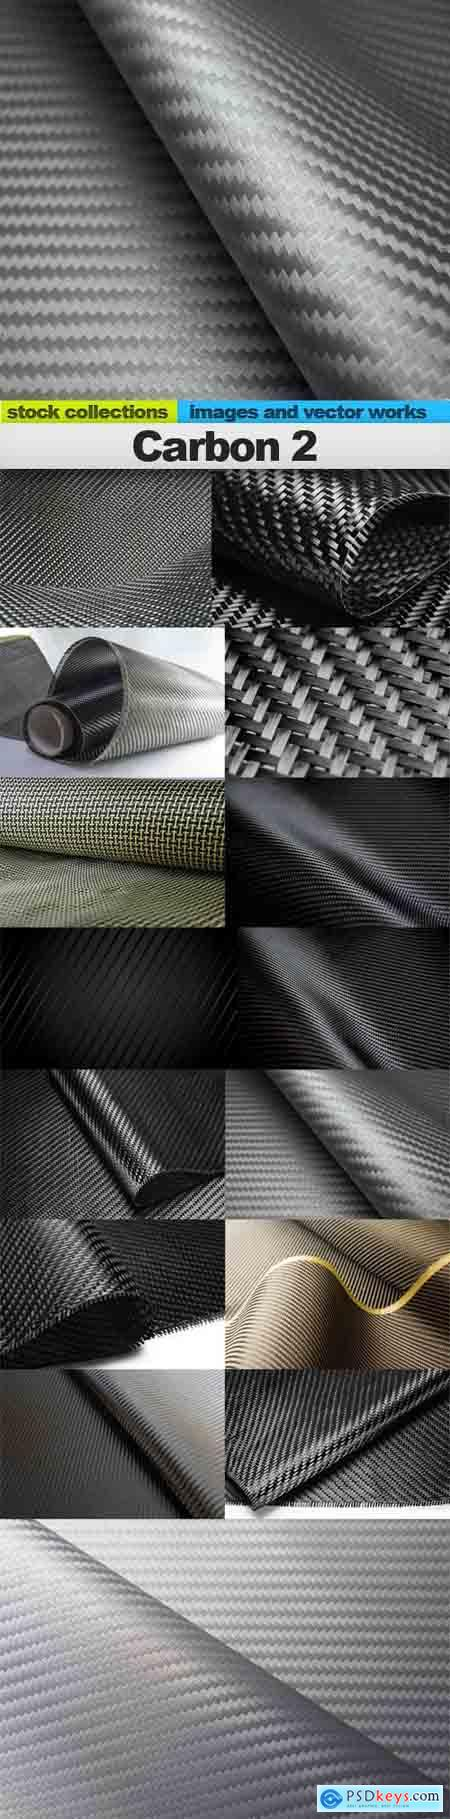 Carbon 2, 15 x UHQ JPEG